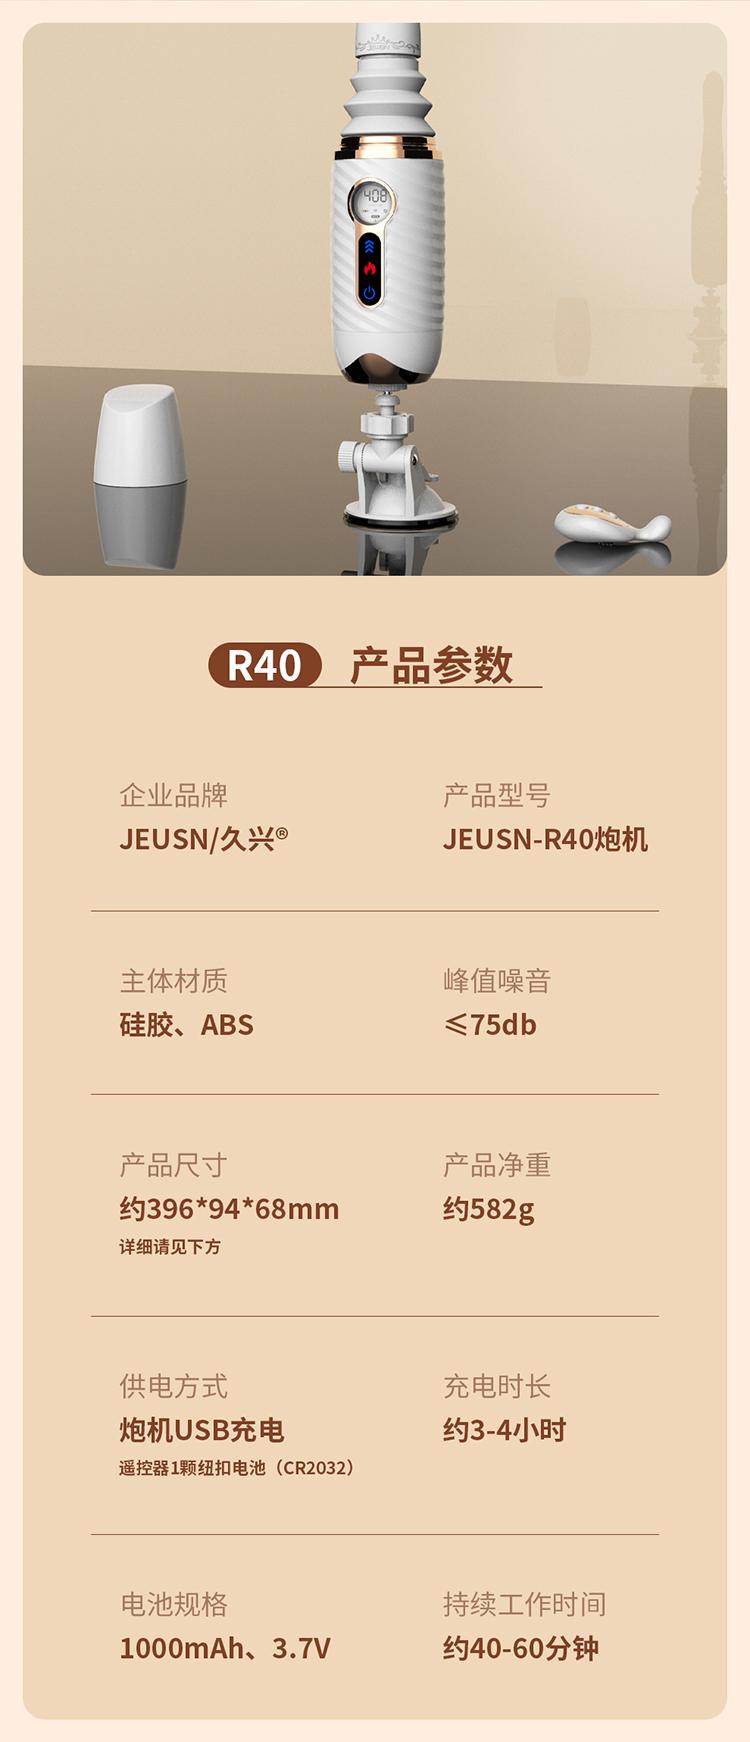 JEUSN-R40炮机详情图_22.jpg